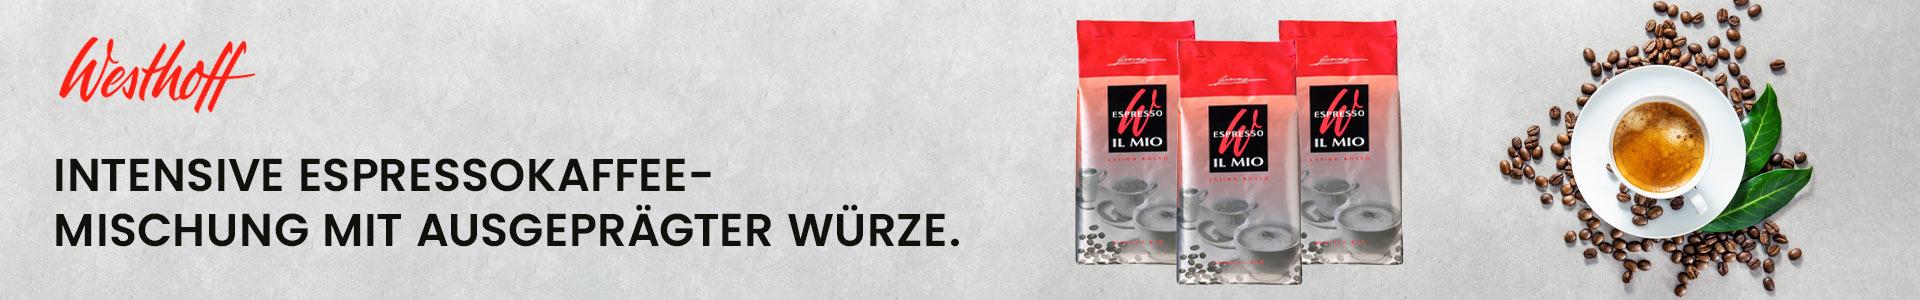 Westhoff Kaffee Banner